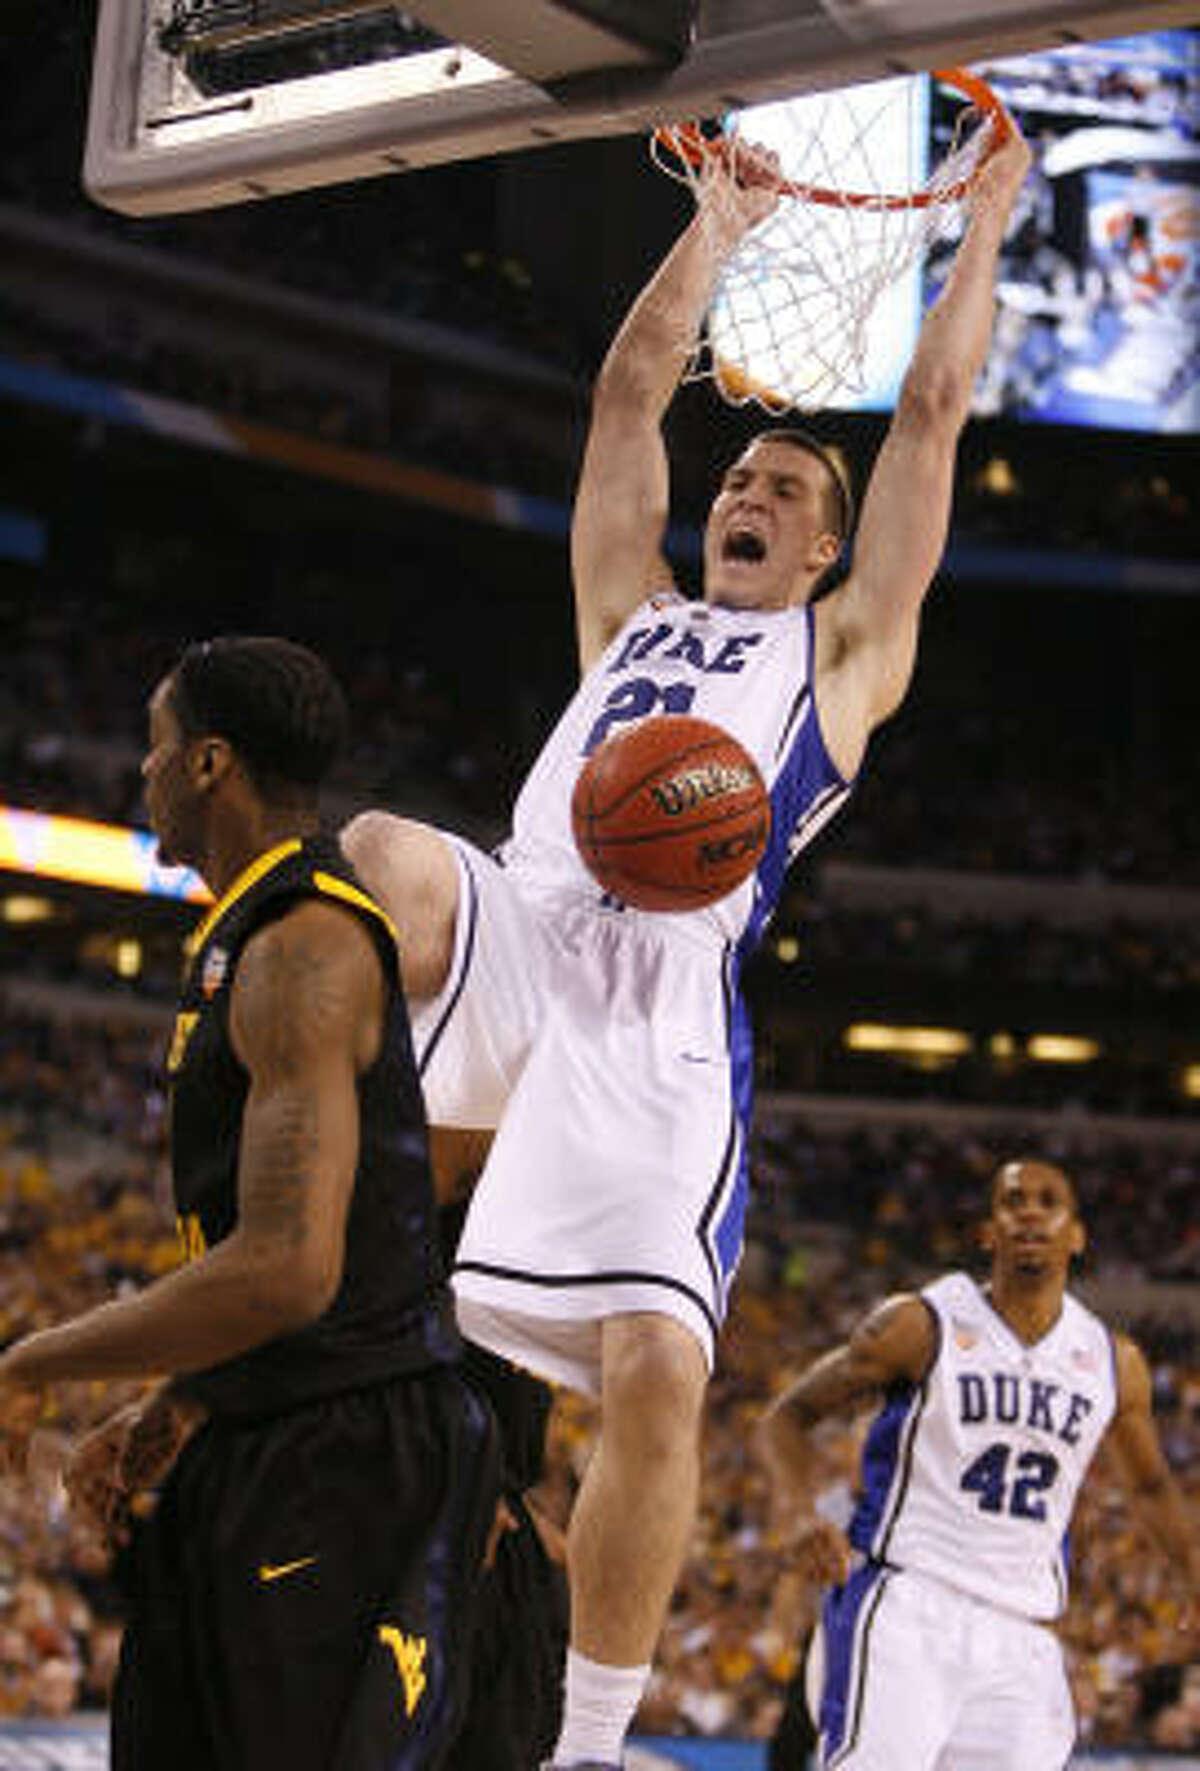 Duke forward Miles Plumlee powers home a dunk.